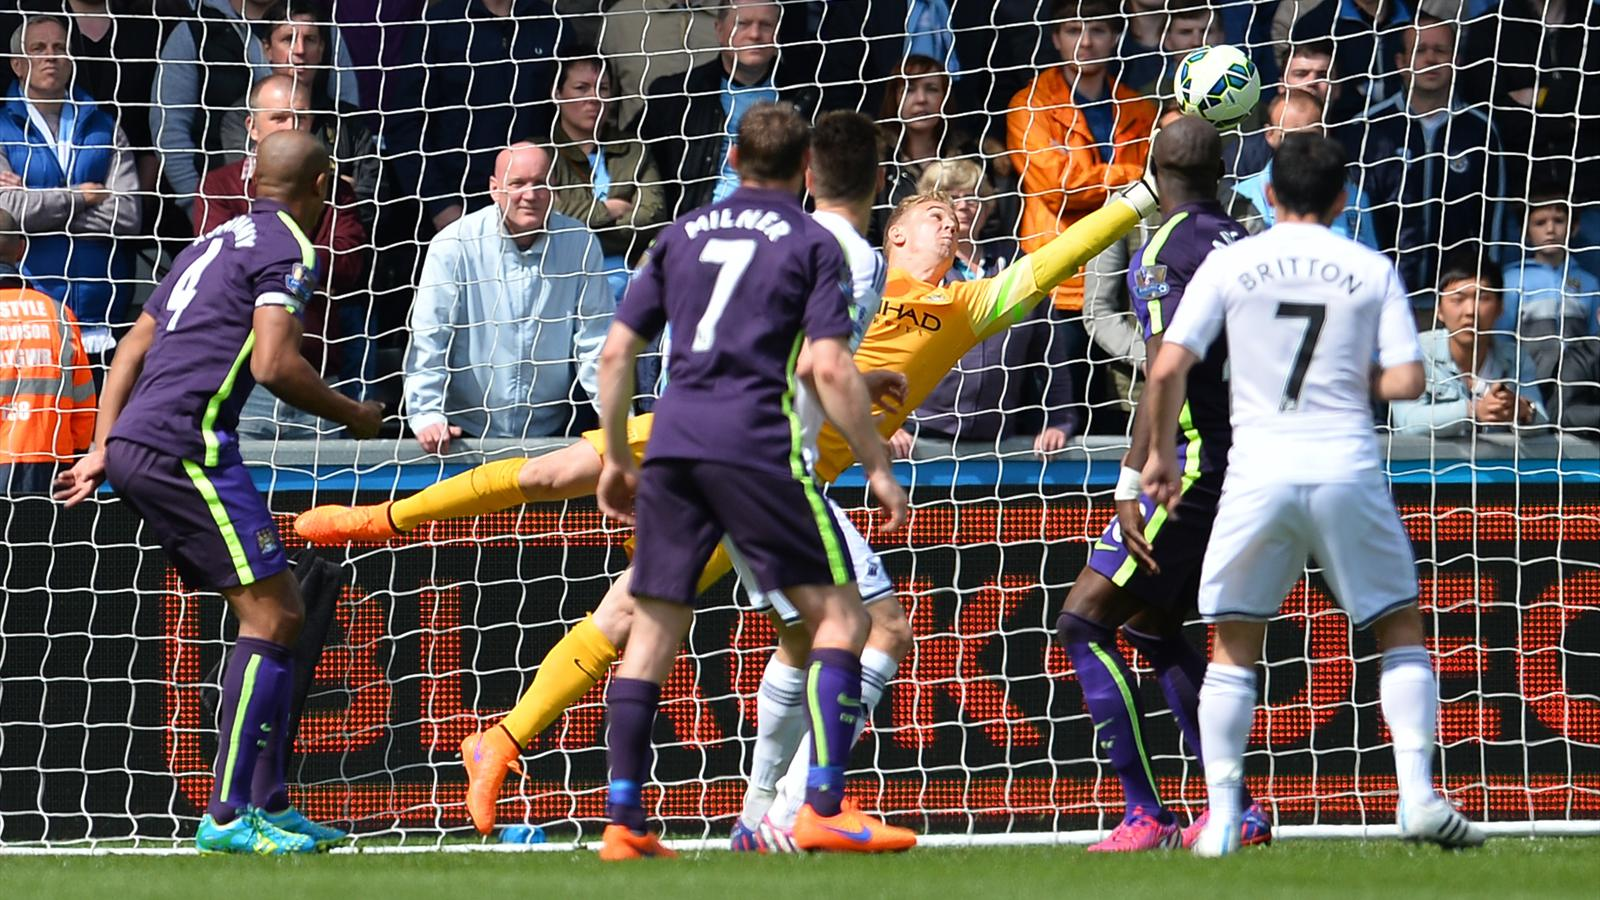 Manchester City goalkeeper Joe Hart makes a brilliant save against Swansea